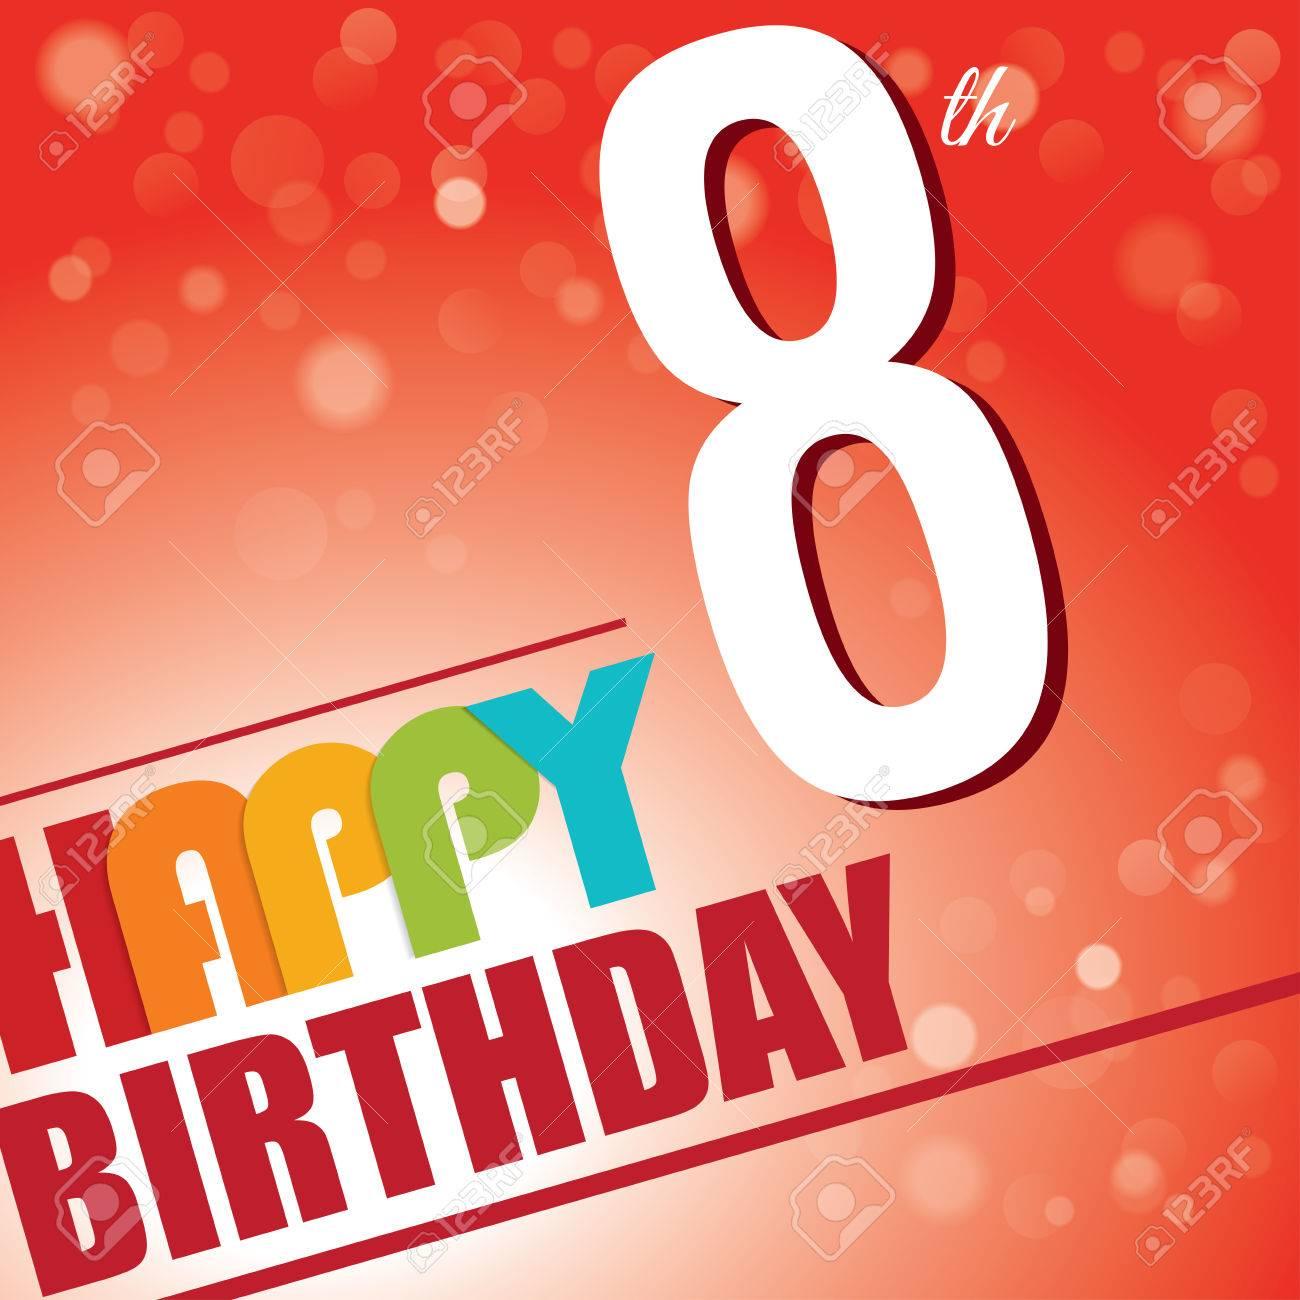 8th Birthday Party Invite Template Design In Bright And Colourful